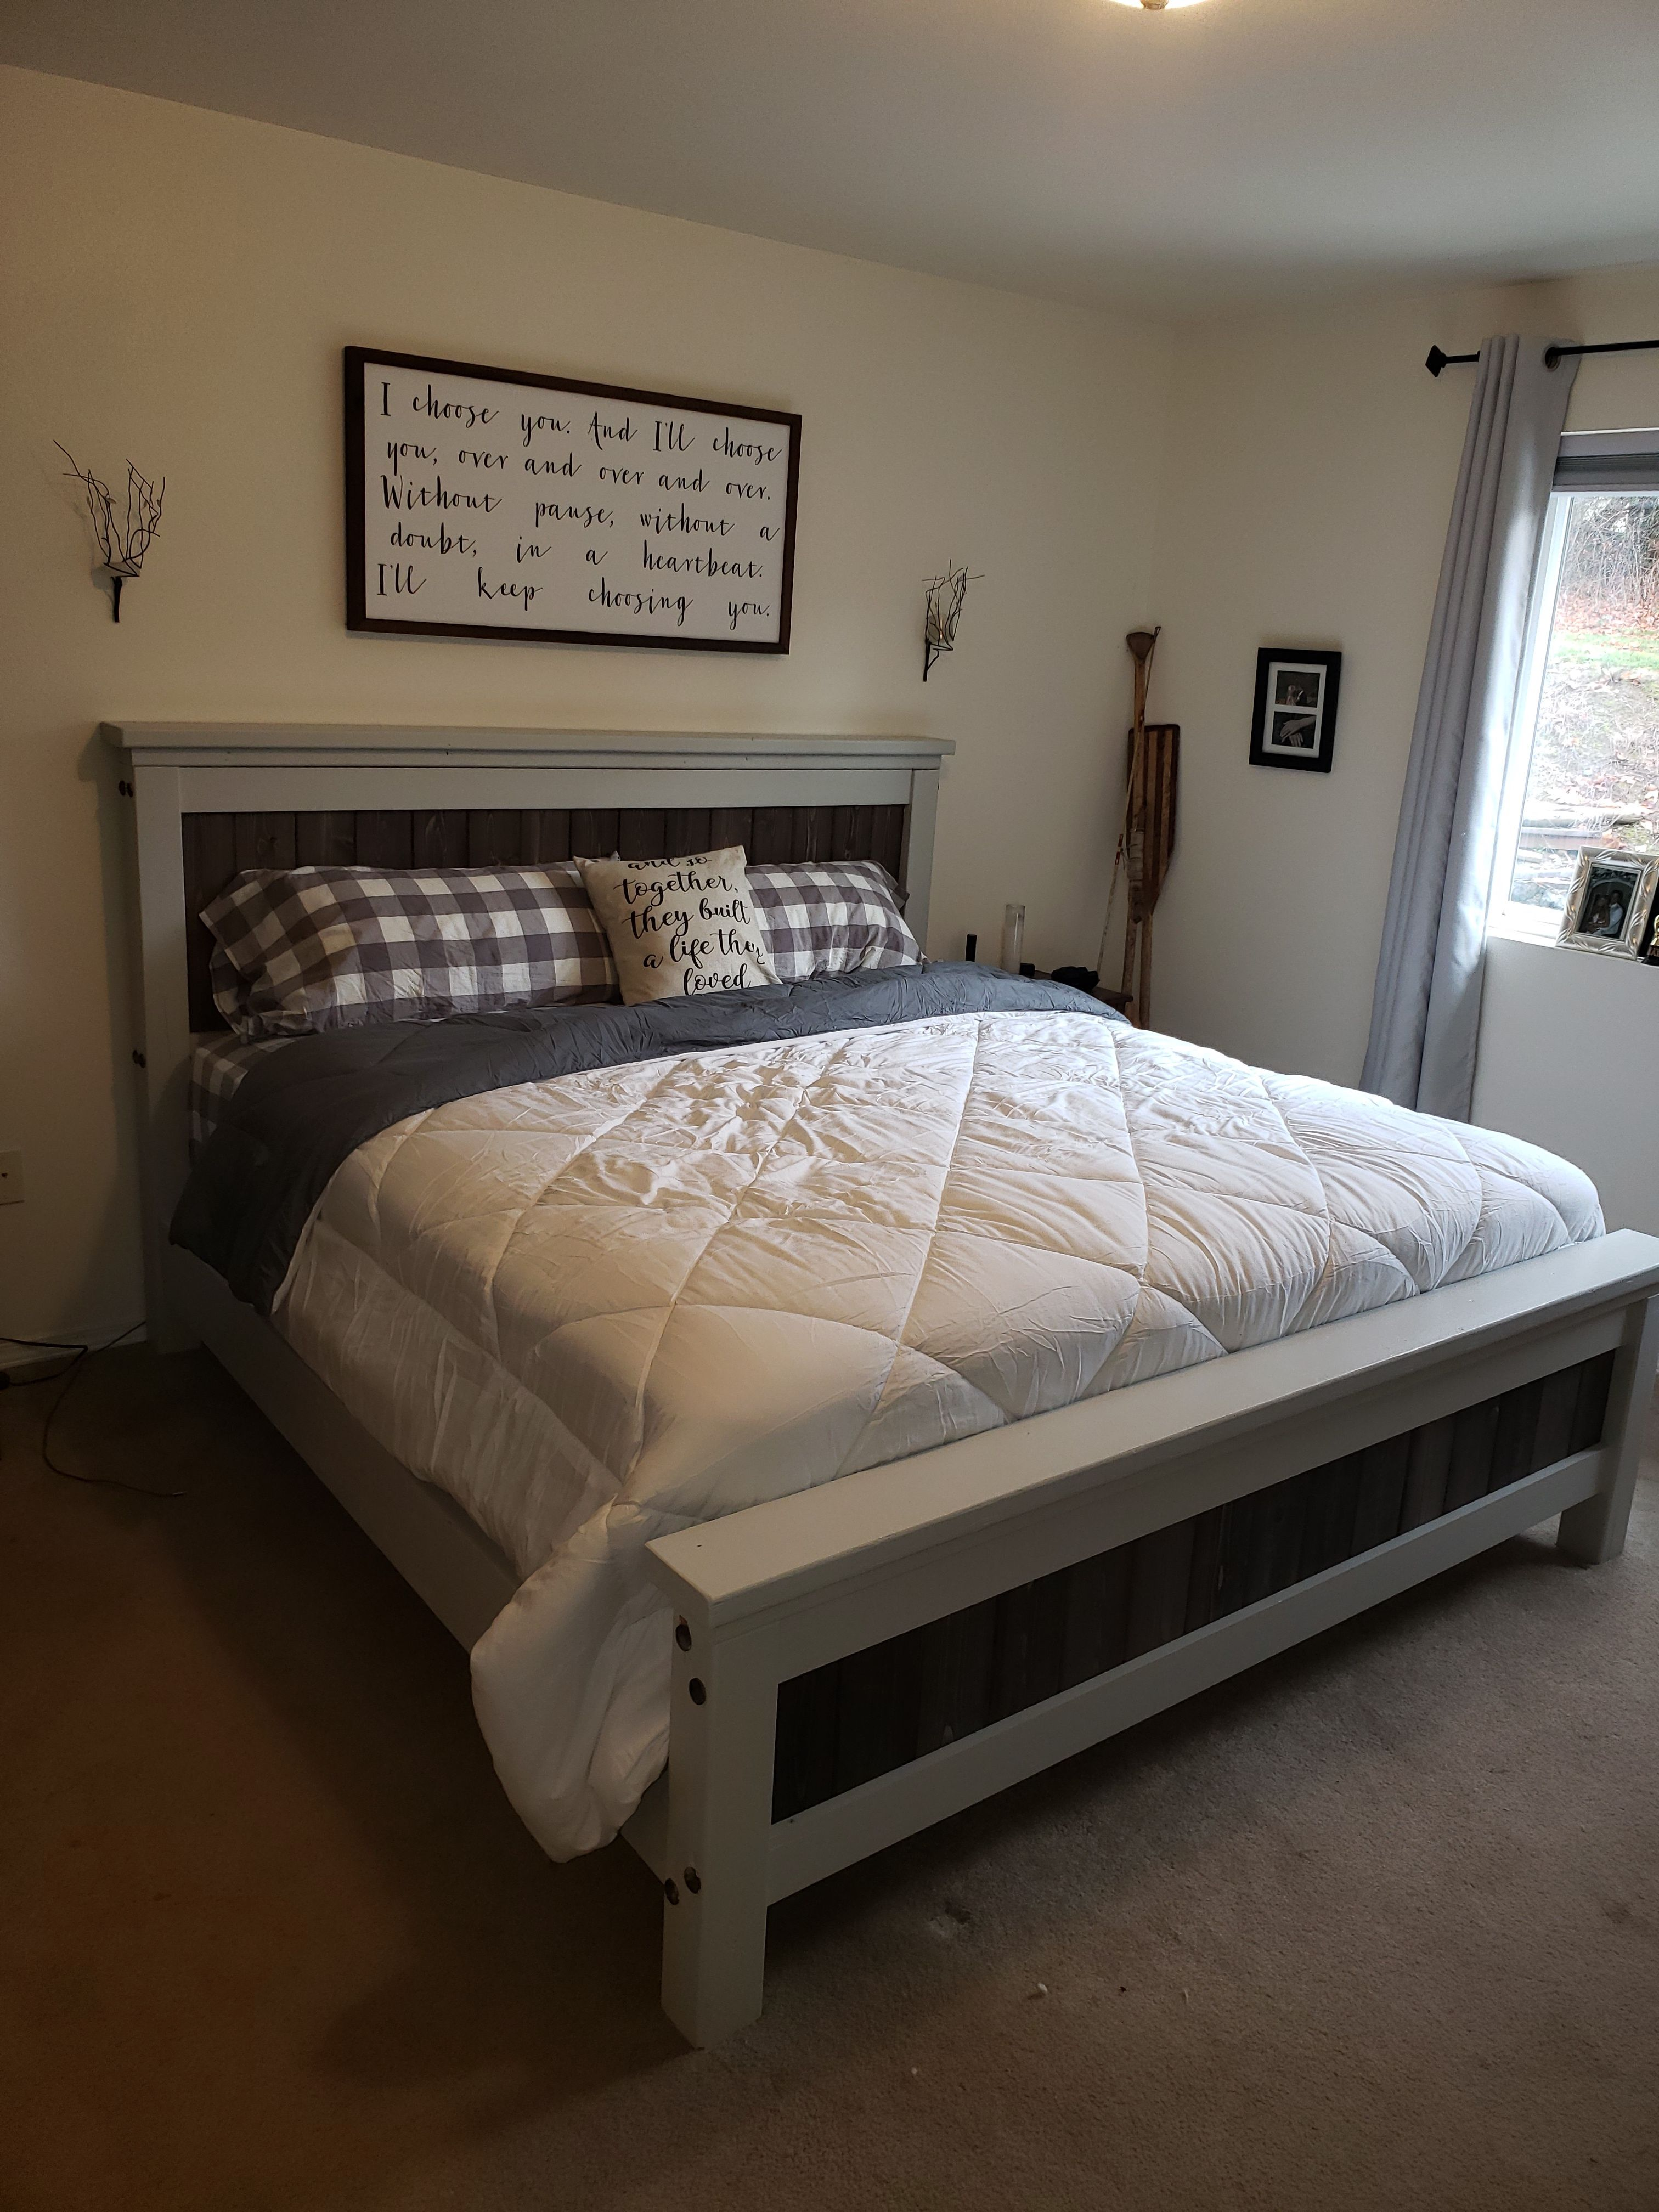 Diy farmhouse bed queen version bed bed plans rustic